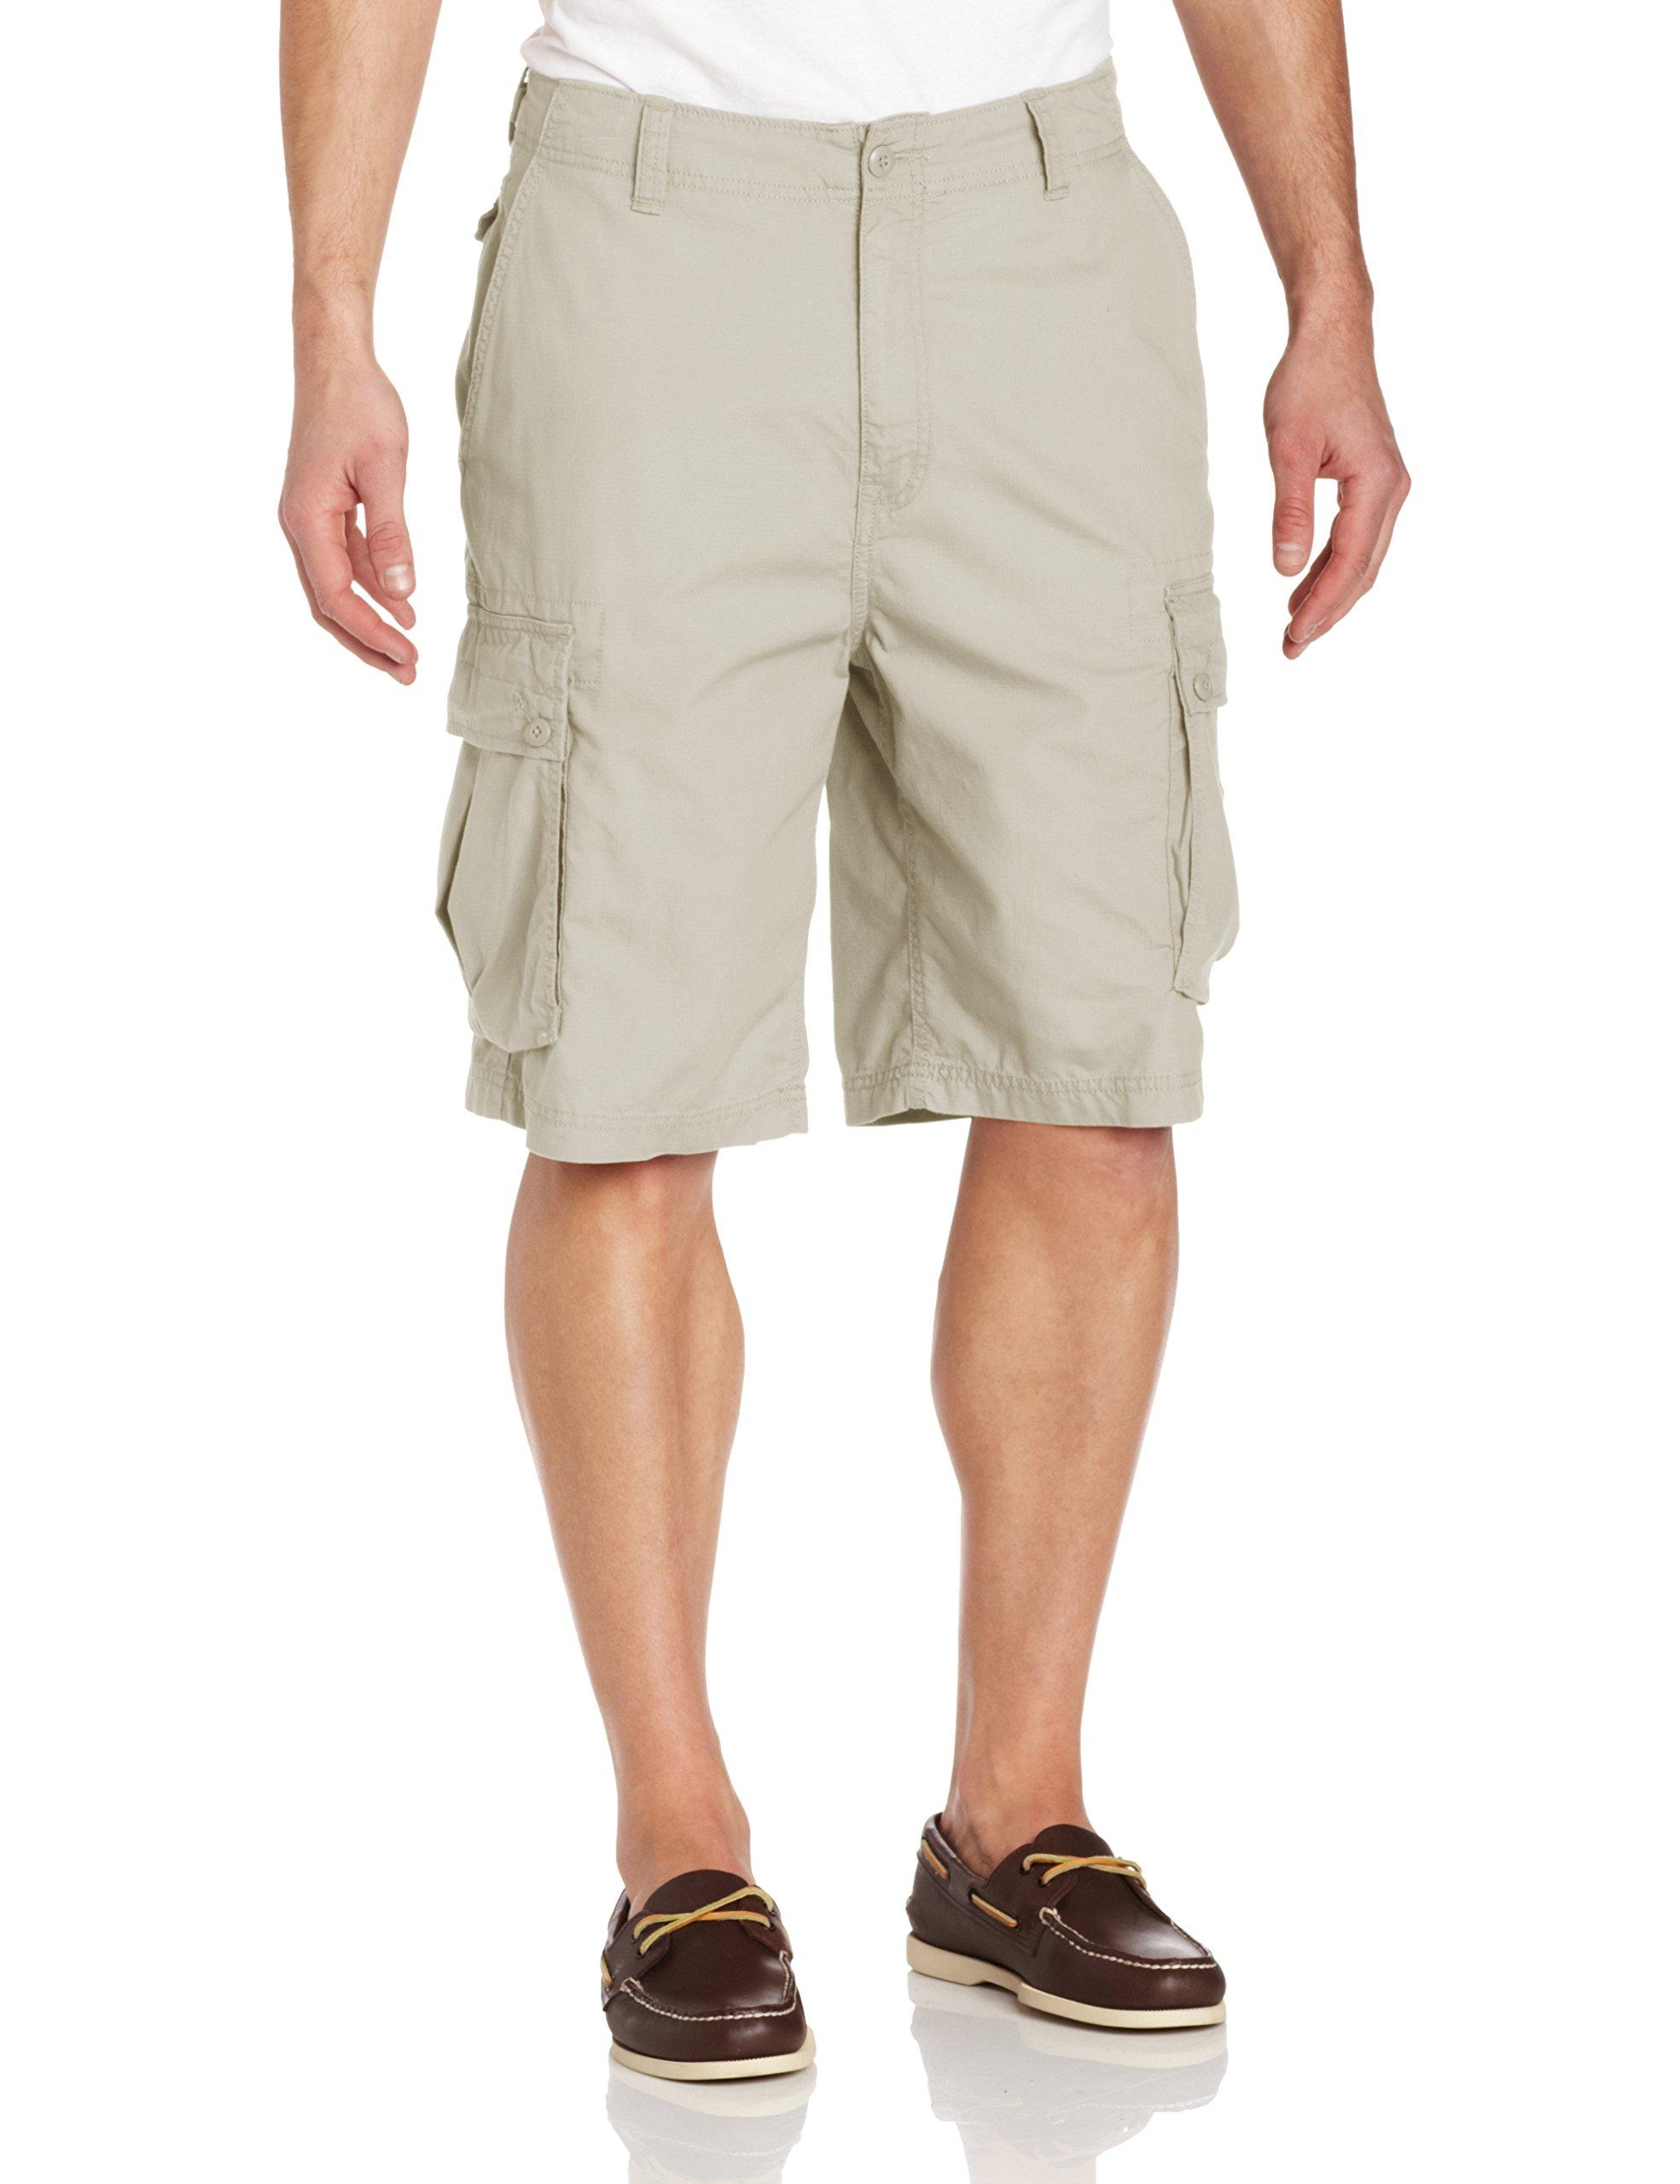 Nautica Men's Mini Ripstop Twill Cargo Short Shorts, Stone, 42W